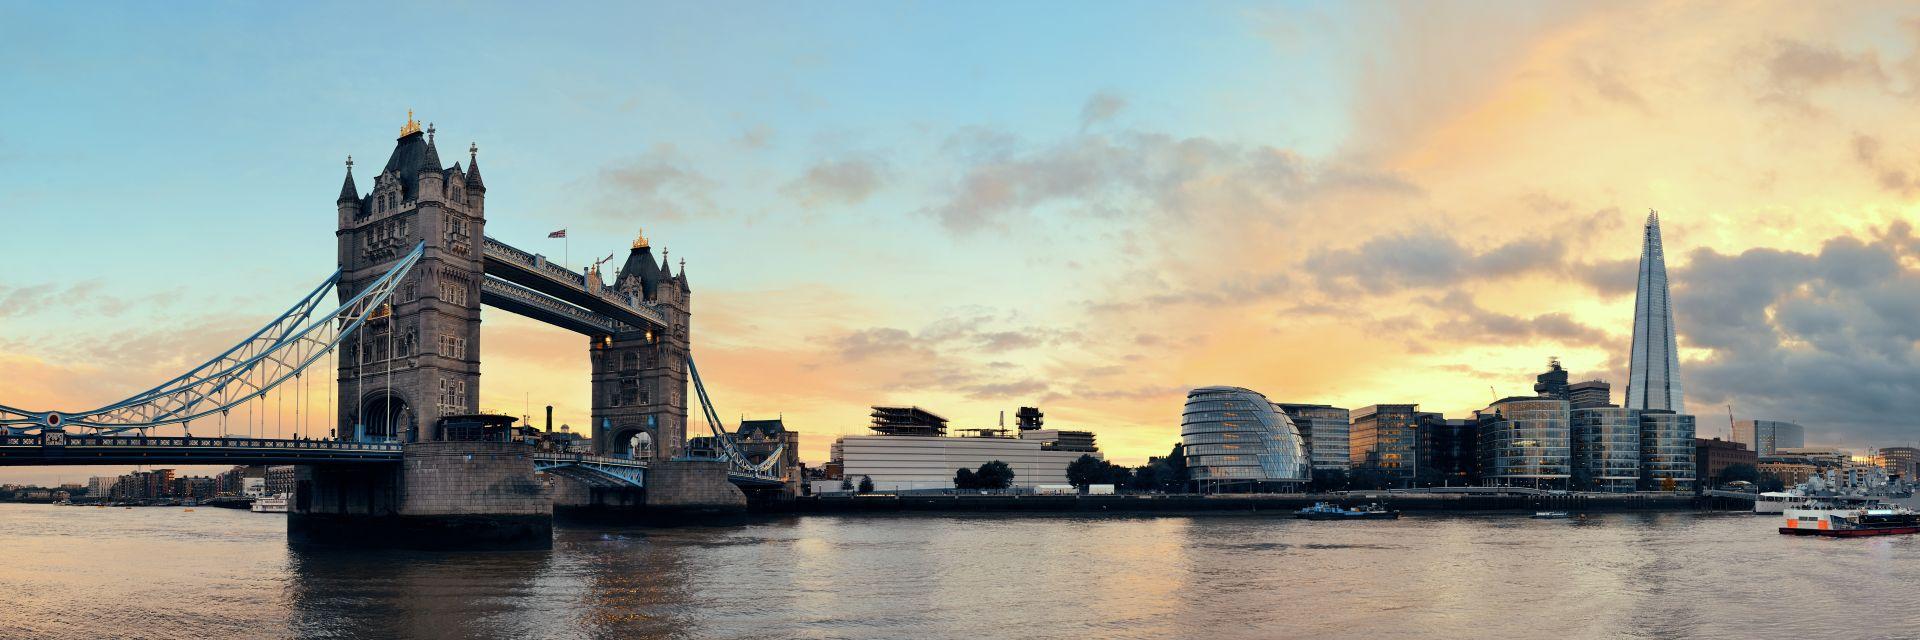 Londyn pri zapadu slunce